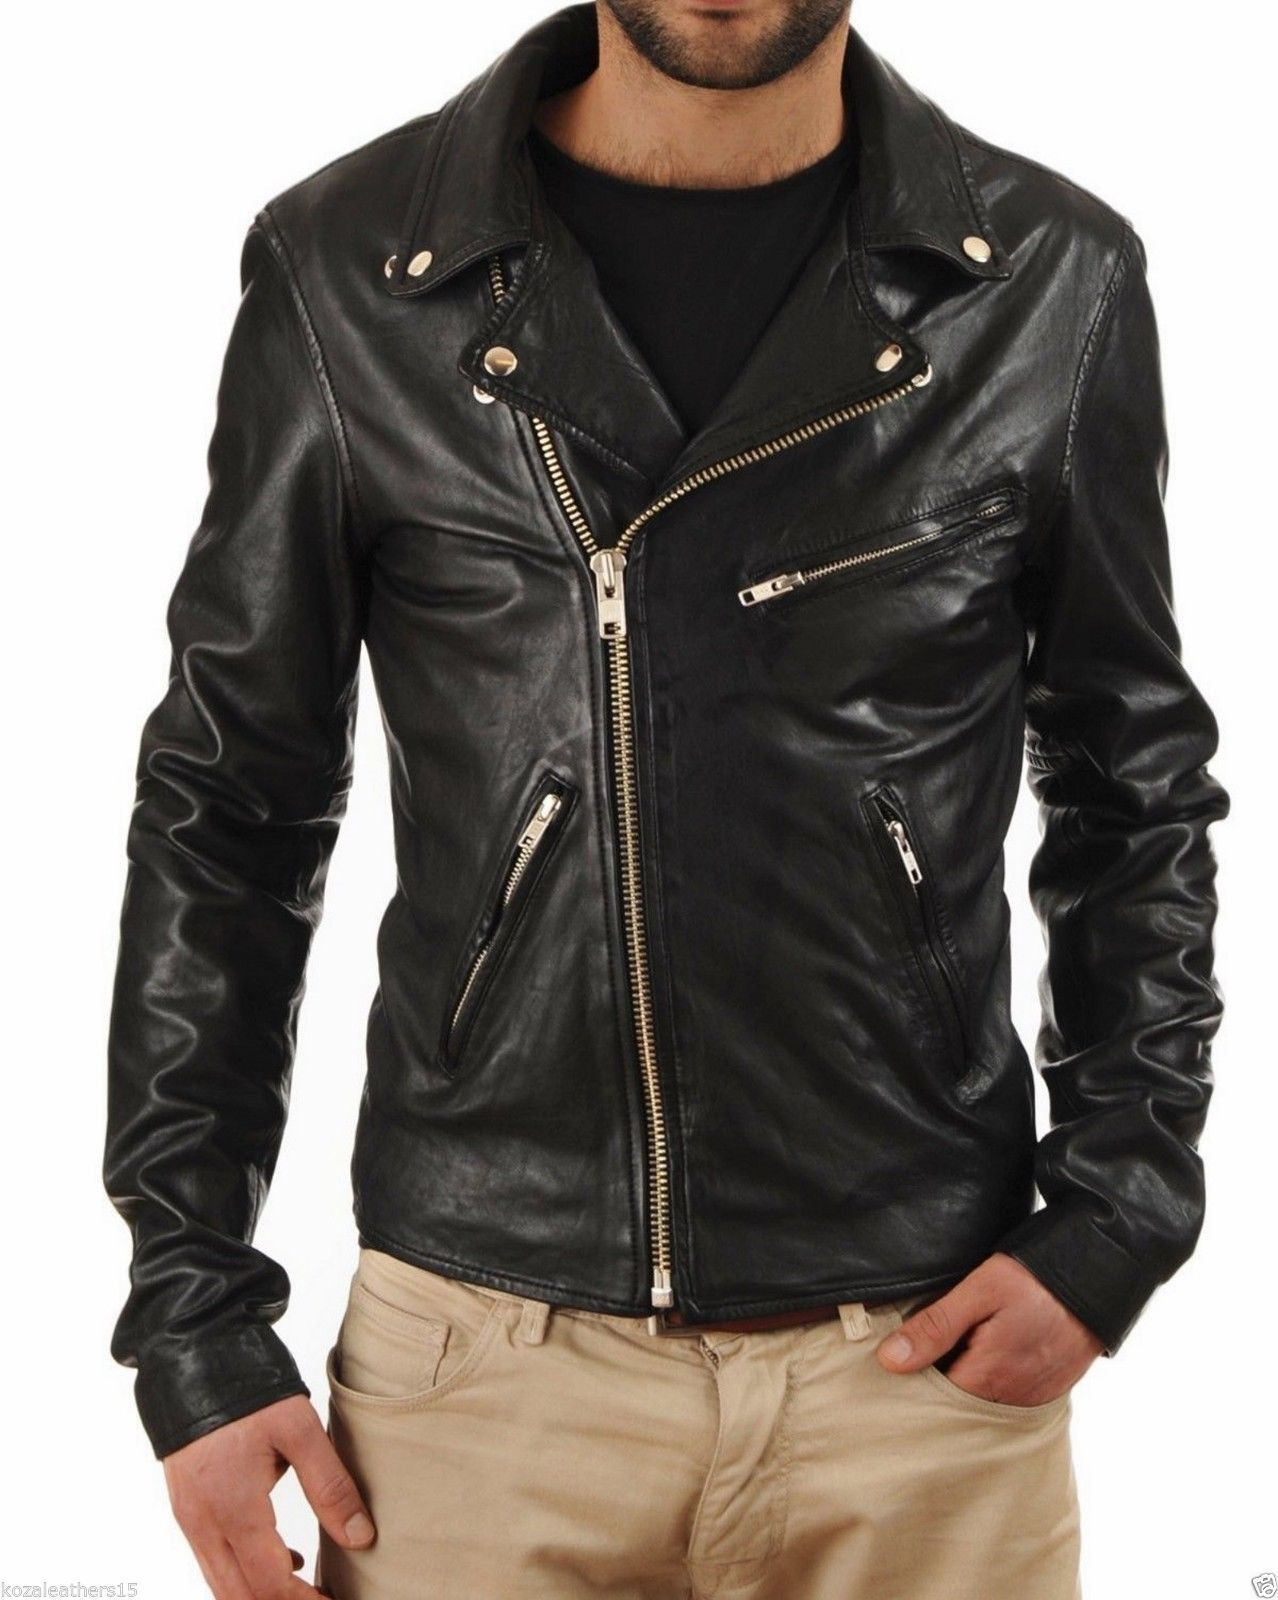 Mens Biker Leather Jacket Men Fashion Black Leather Jacket Men Leather Jackets Outerwear Leather Jacket Men Fitted Biker Jacket Lambskin Jacket [ 1600 x 1278 Pixel ]